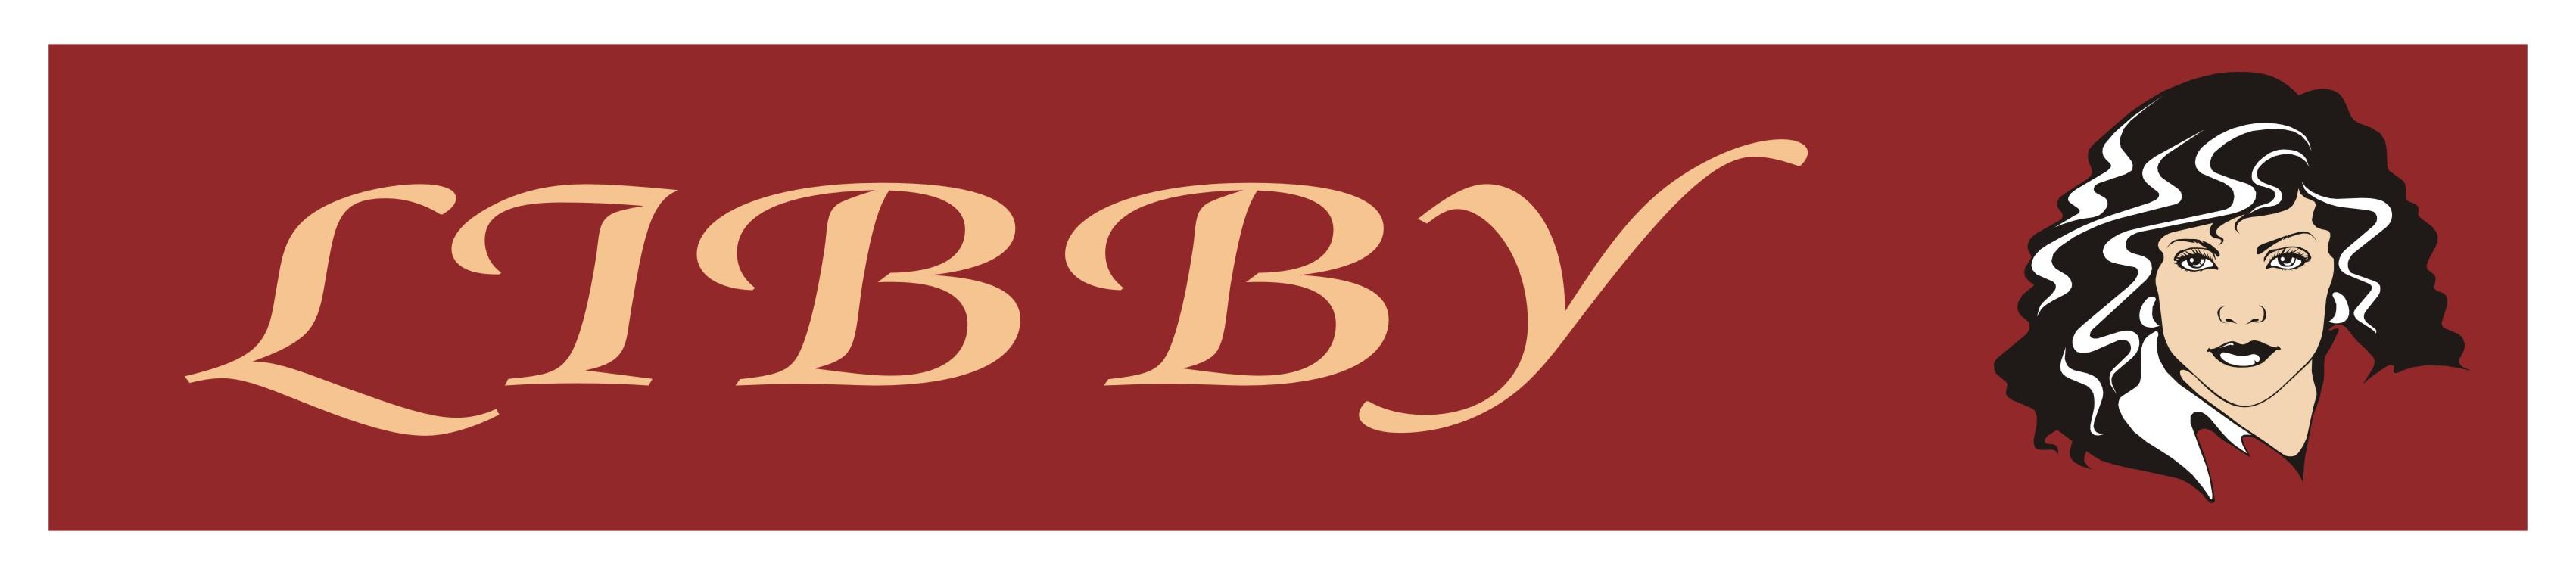 Libby - Kadeřnictví a Kosmetika